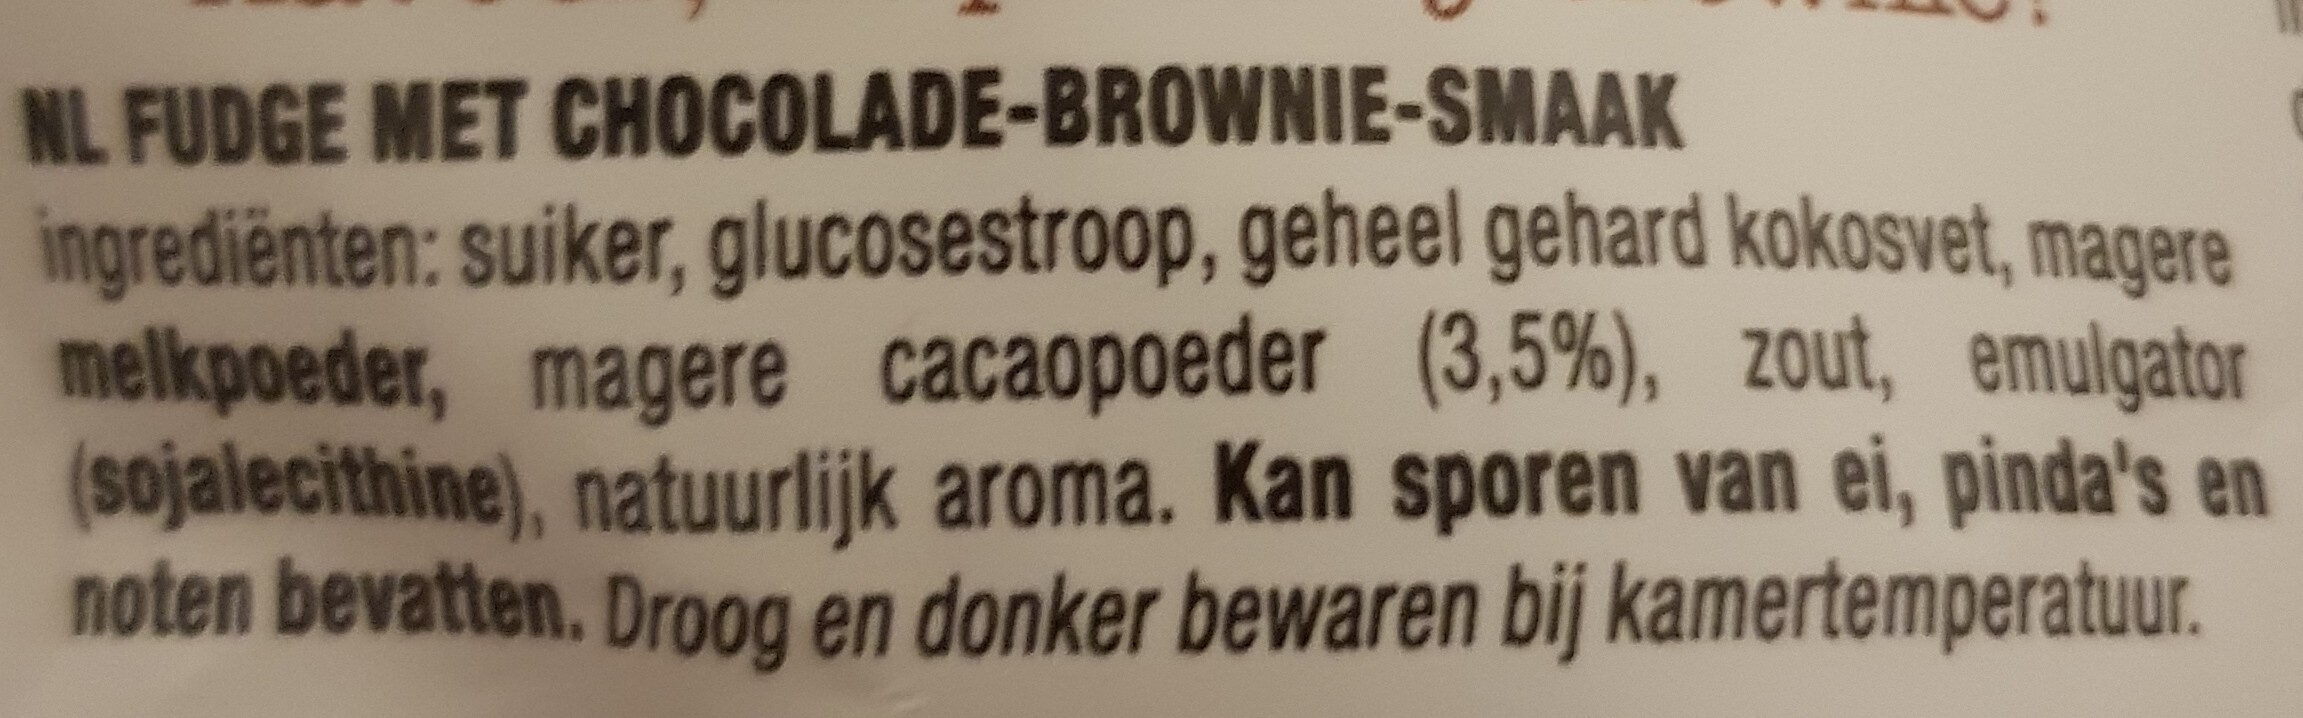 Soft Fudge Chocolate Brownie - Inhaltsstoffe - nl